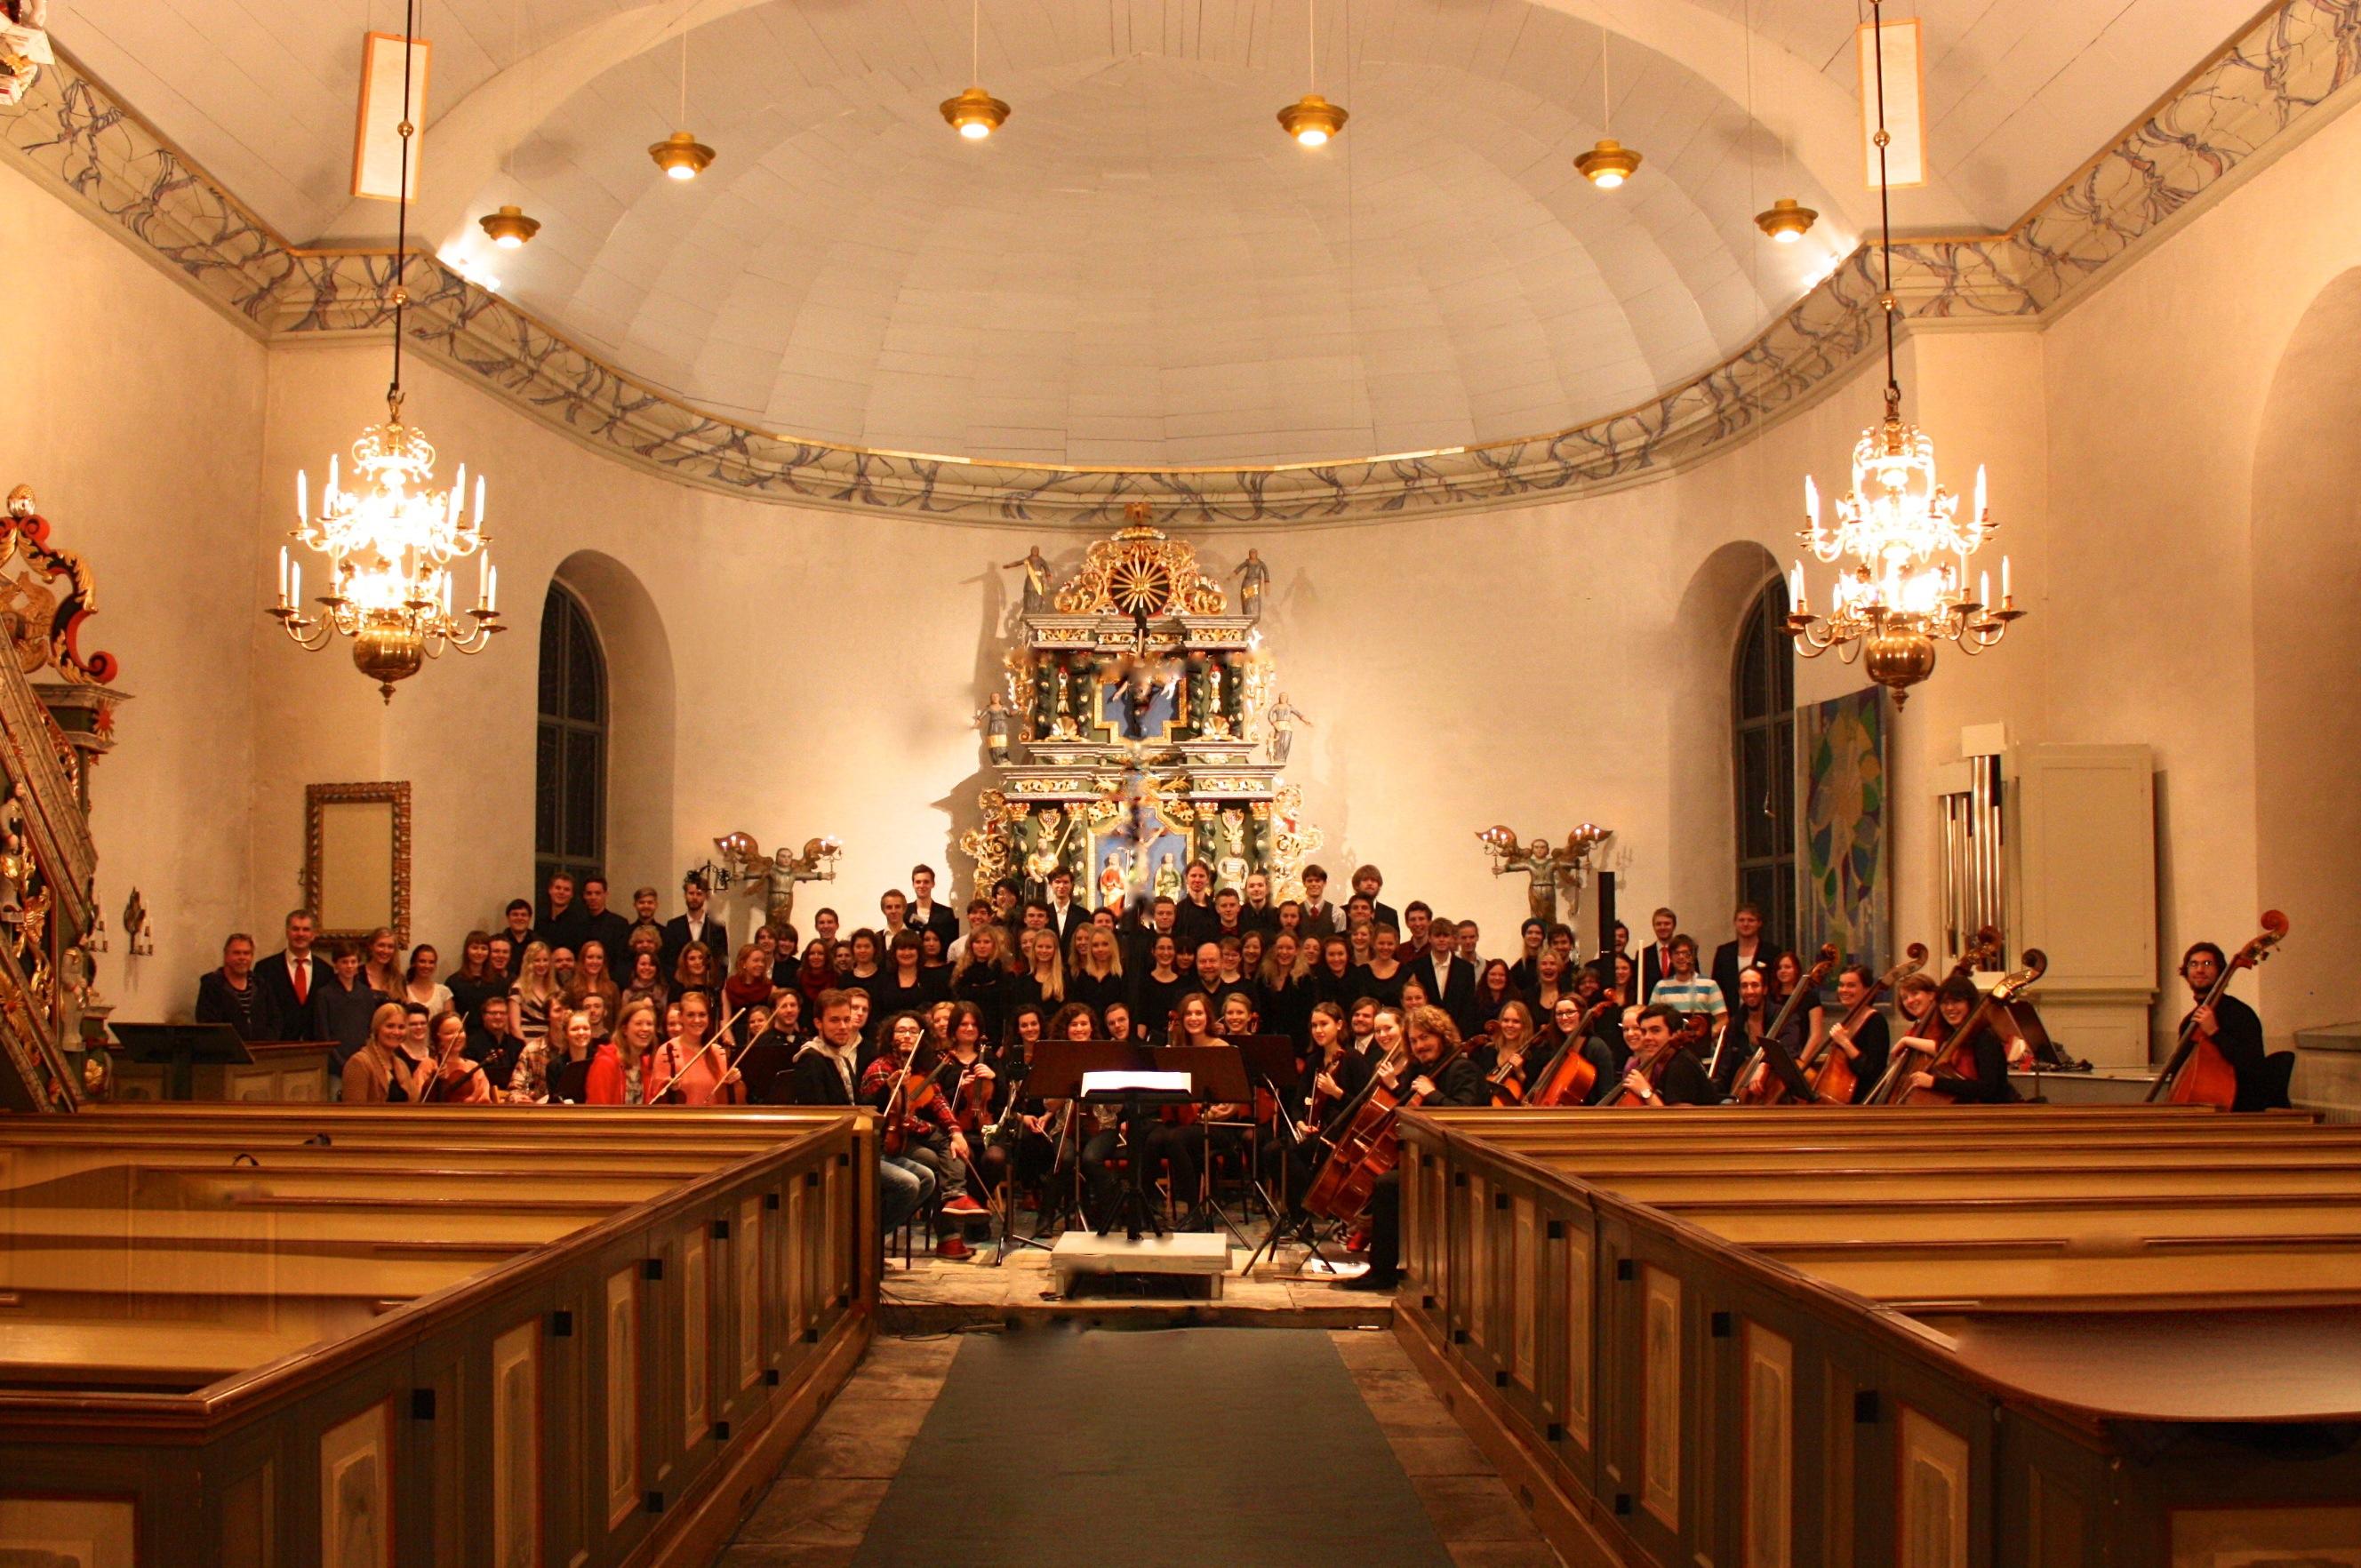 150 Ungdomar möter Bach & Händel